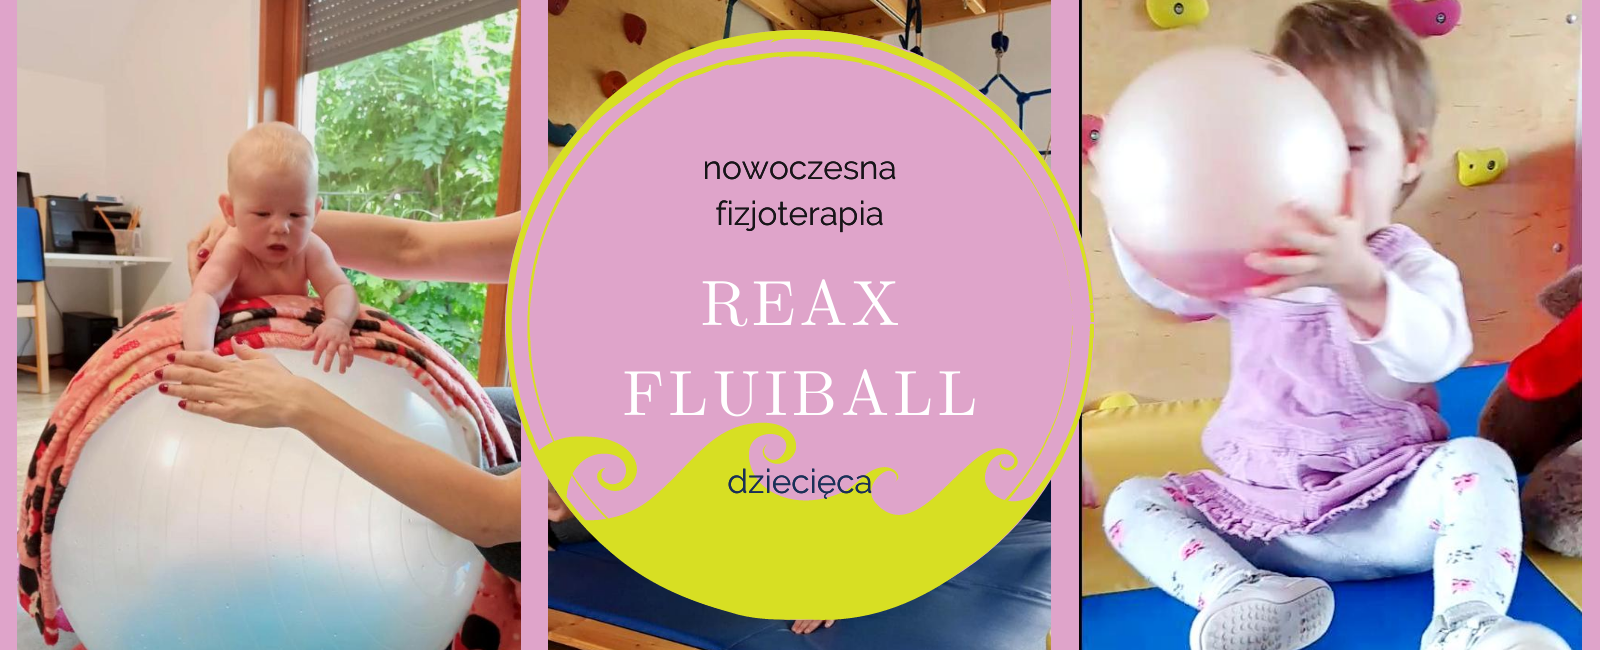 Pilka Reax Fluiball Do Terapii I Rehabilitacji Dzieci Reaxing.jpg